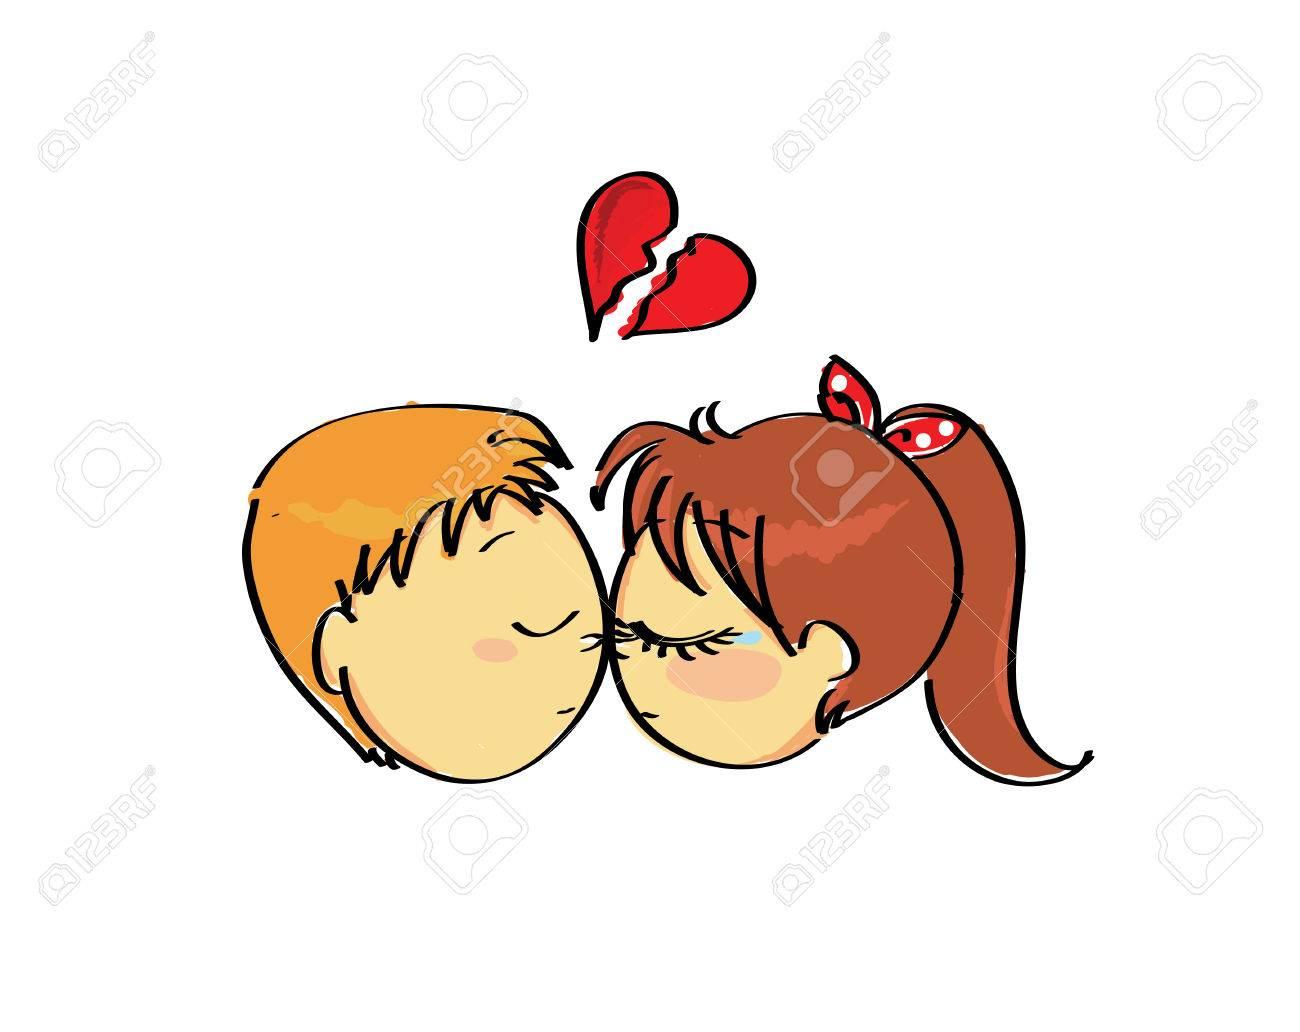 couple with broken heart - 23639676